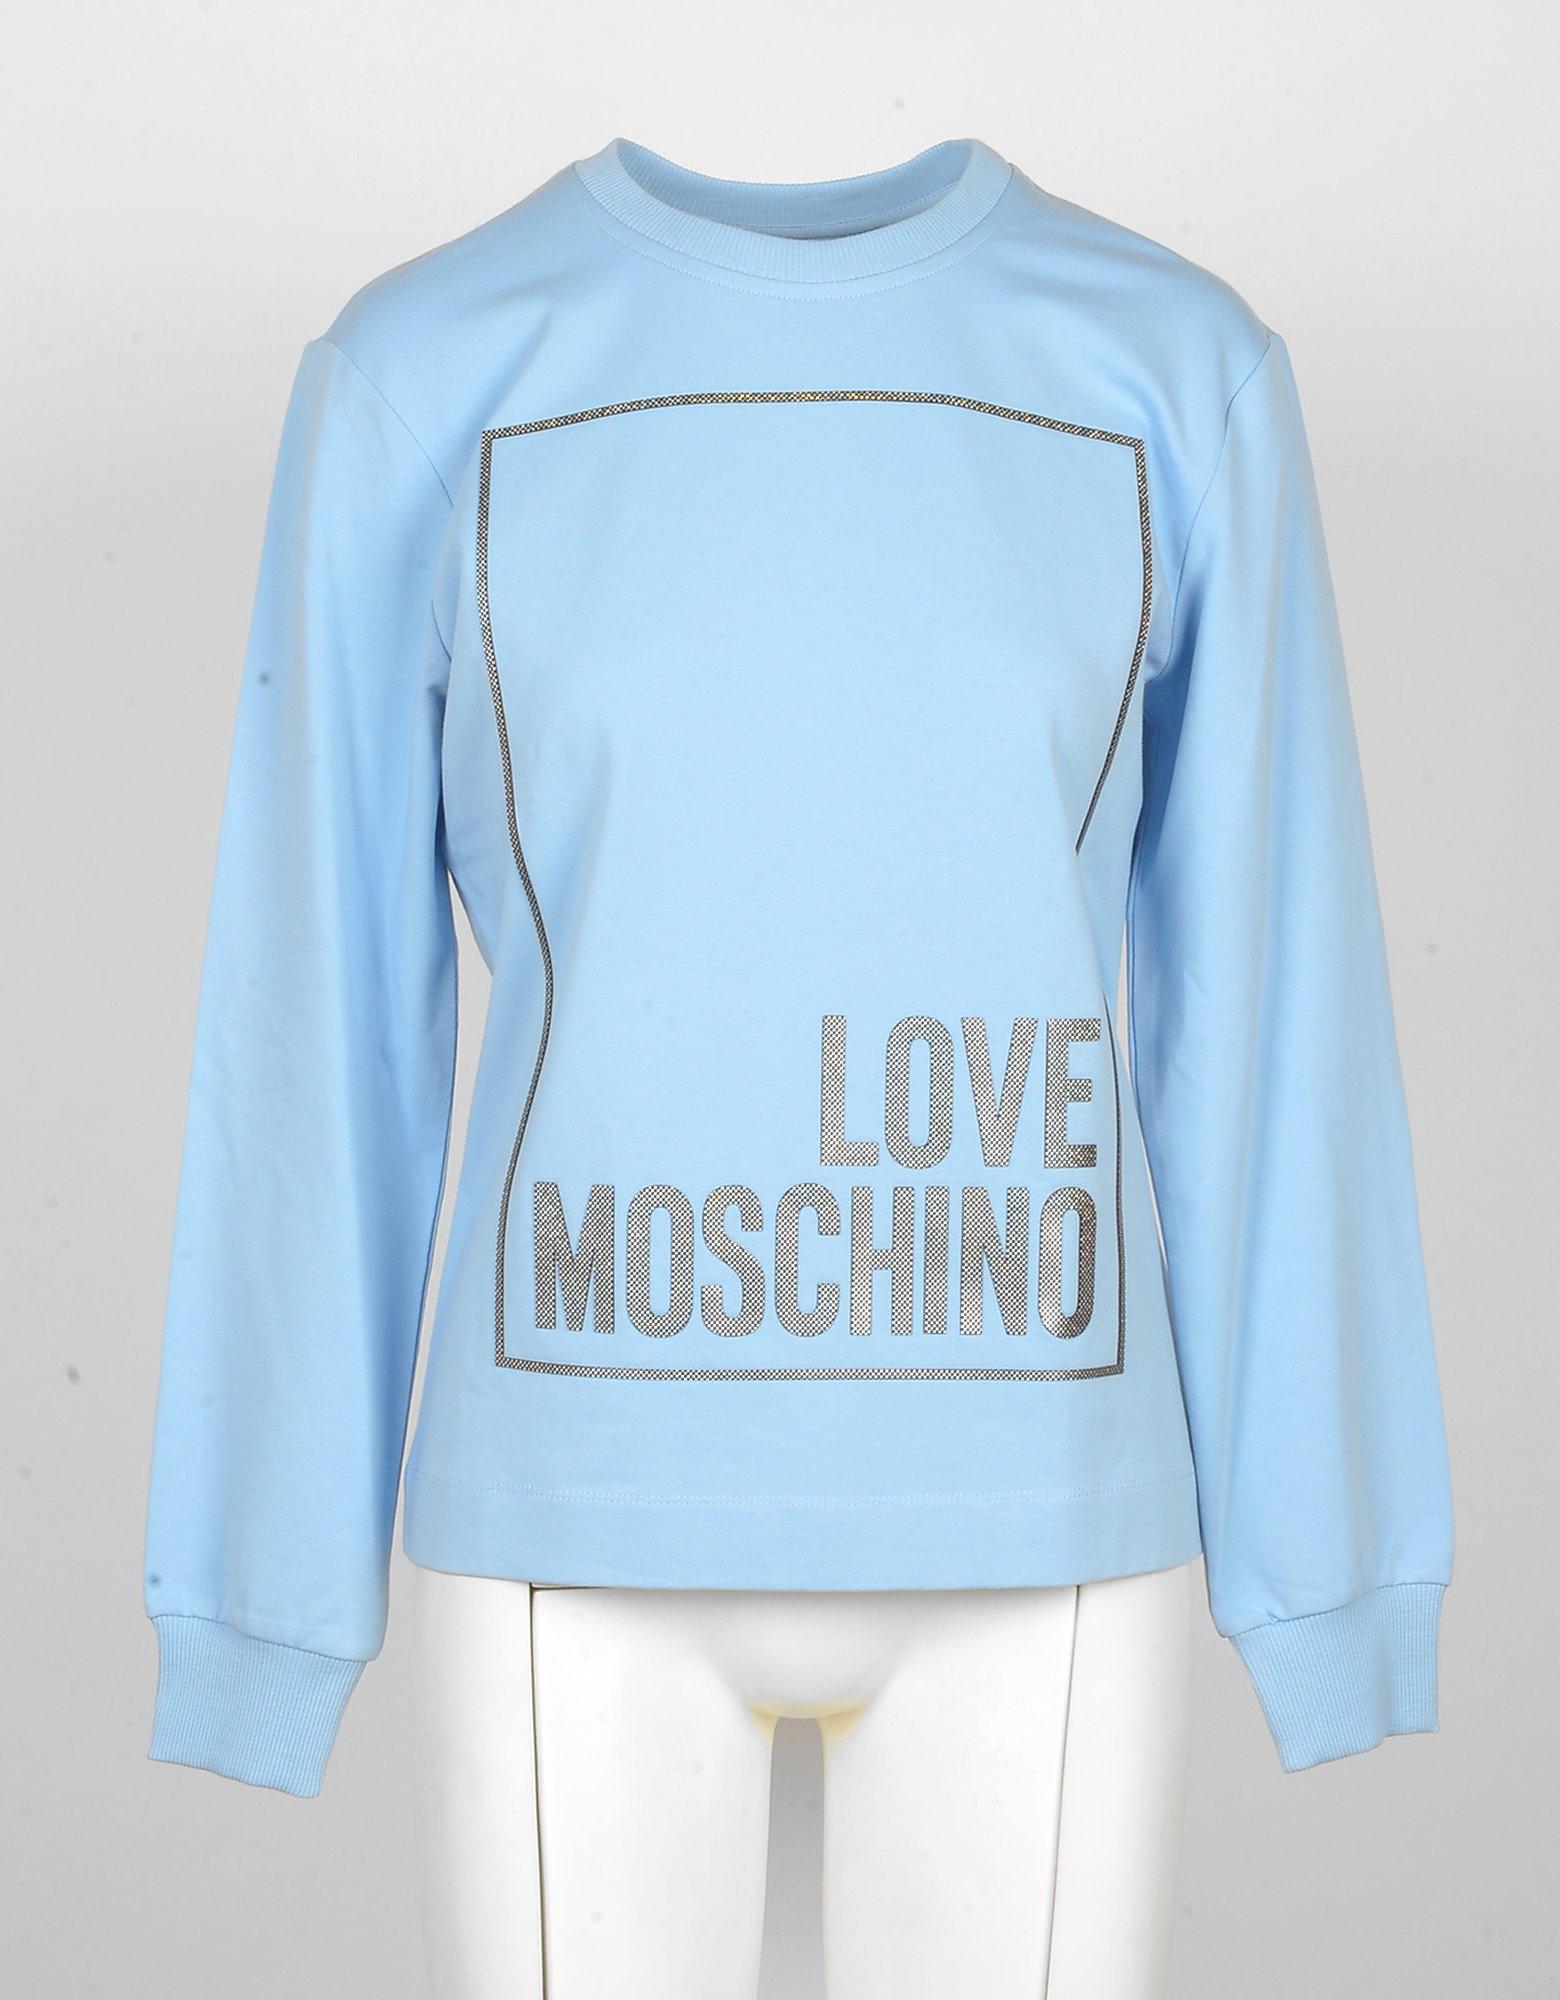 Love Moschino Designer Sweatshirts, Women's Sky Blue Sweatshirt